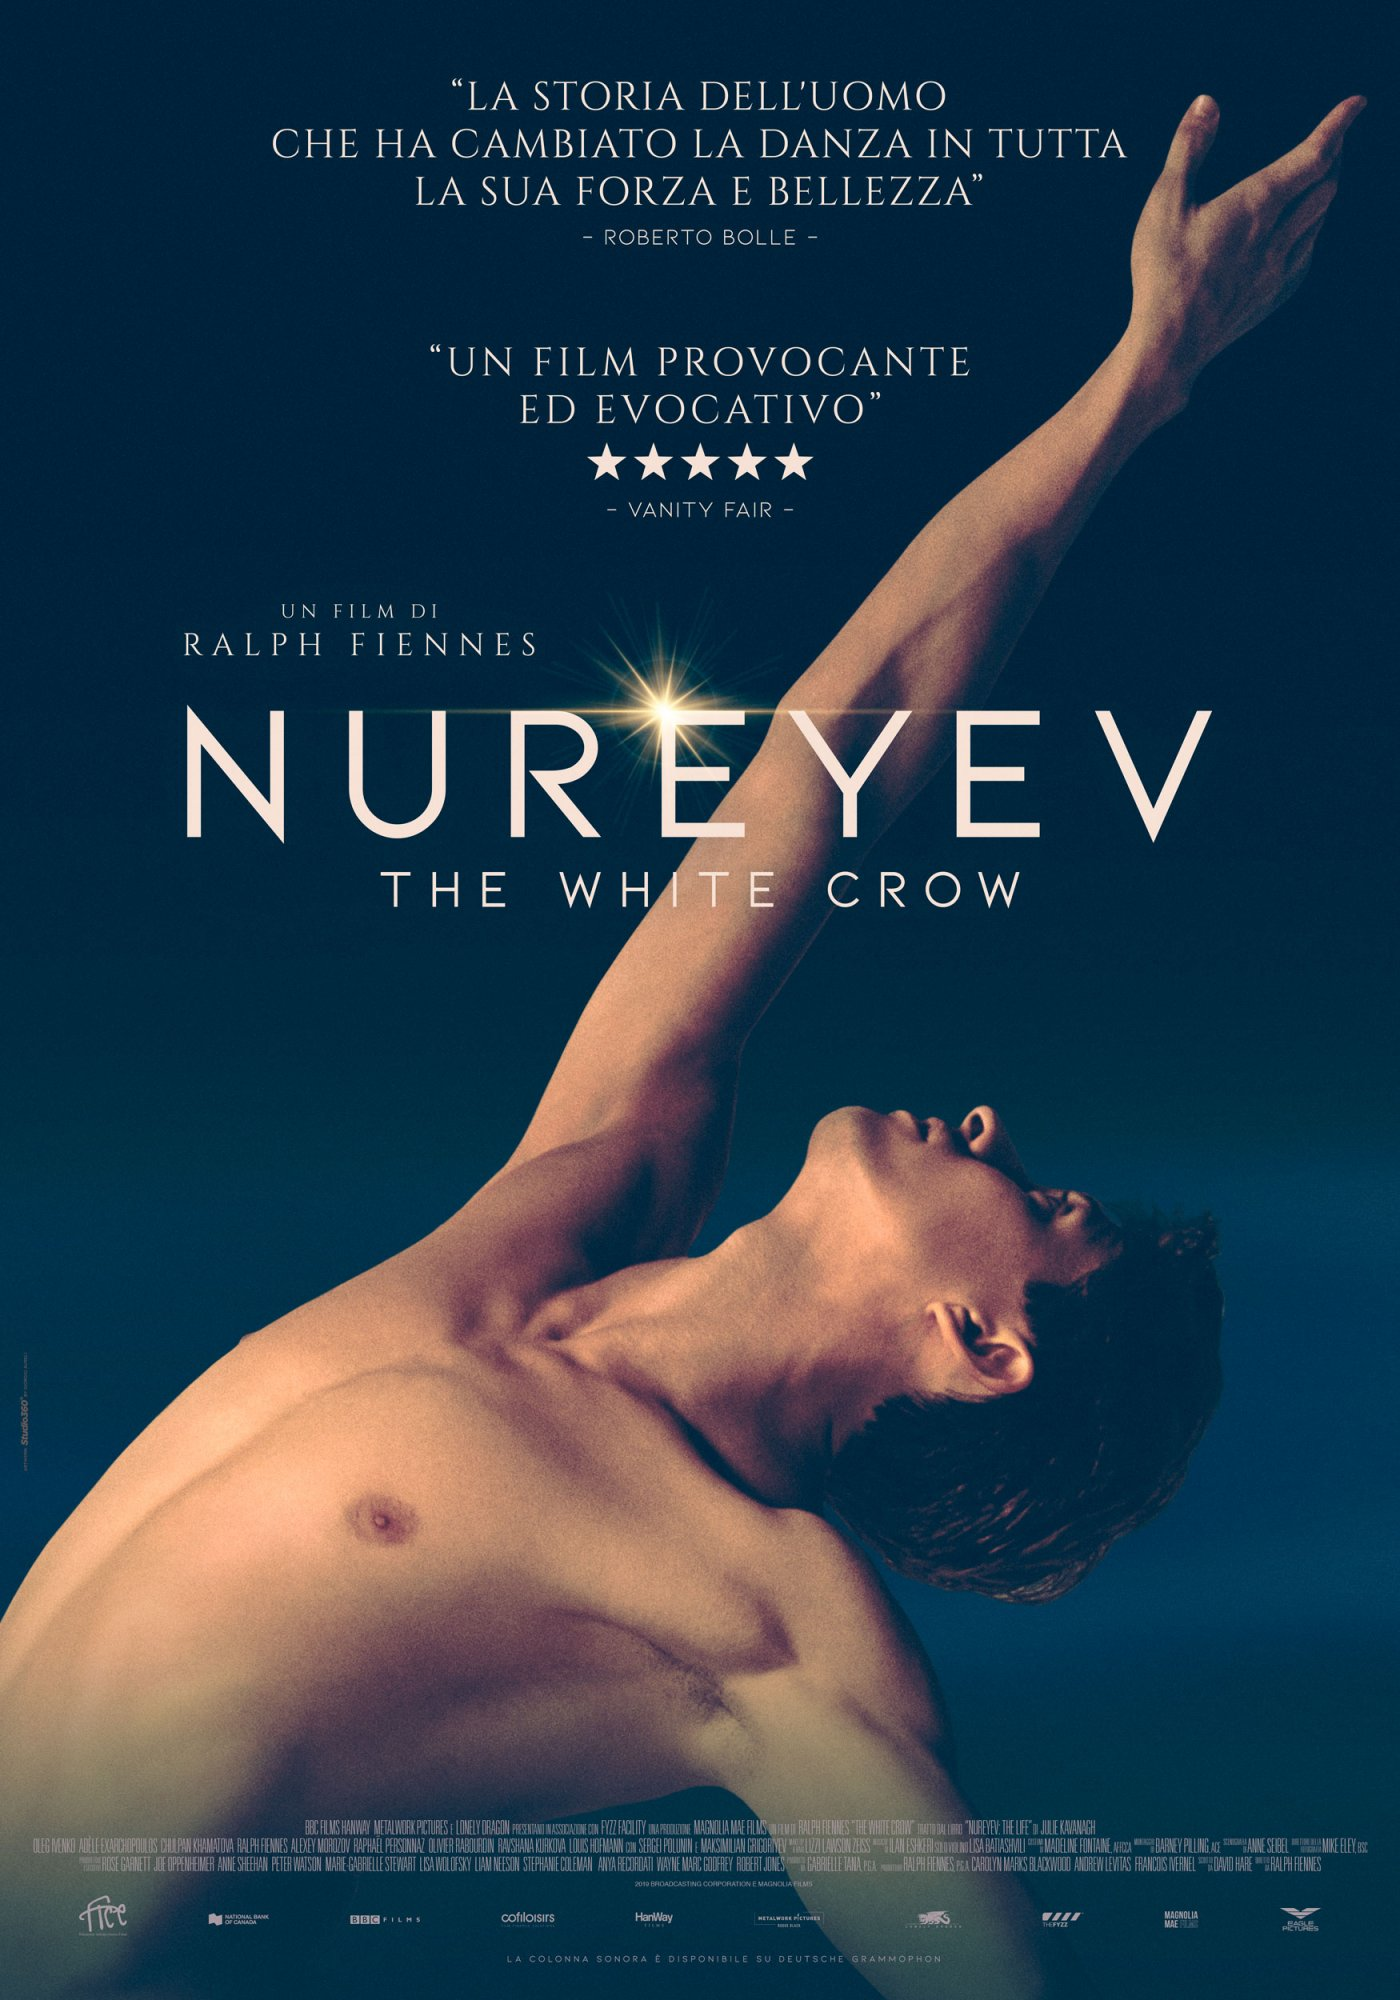 Nureyev. The White Crow